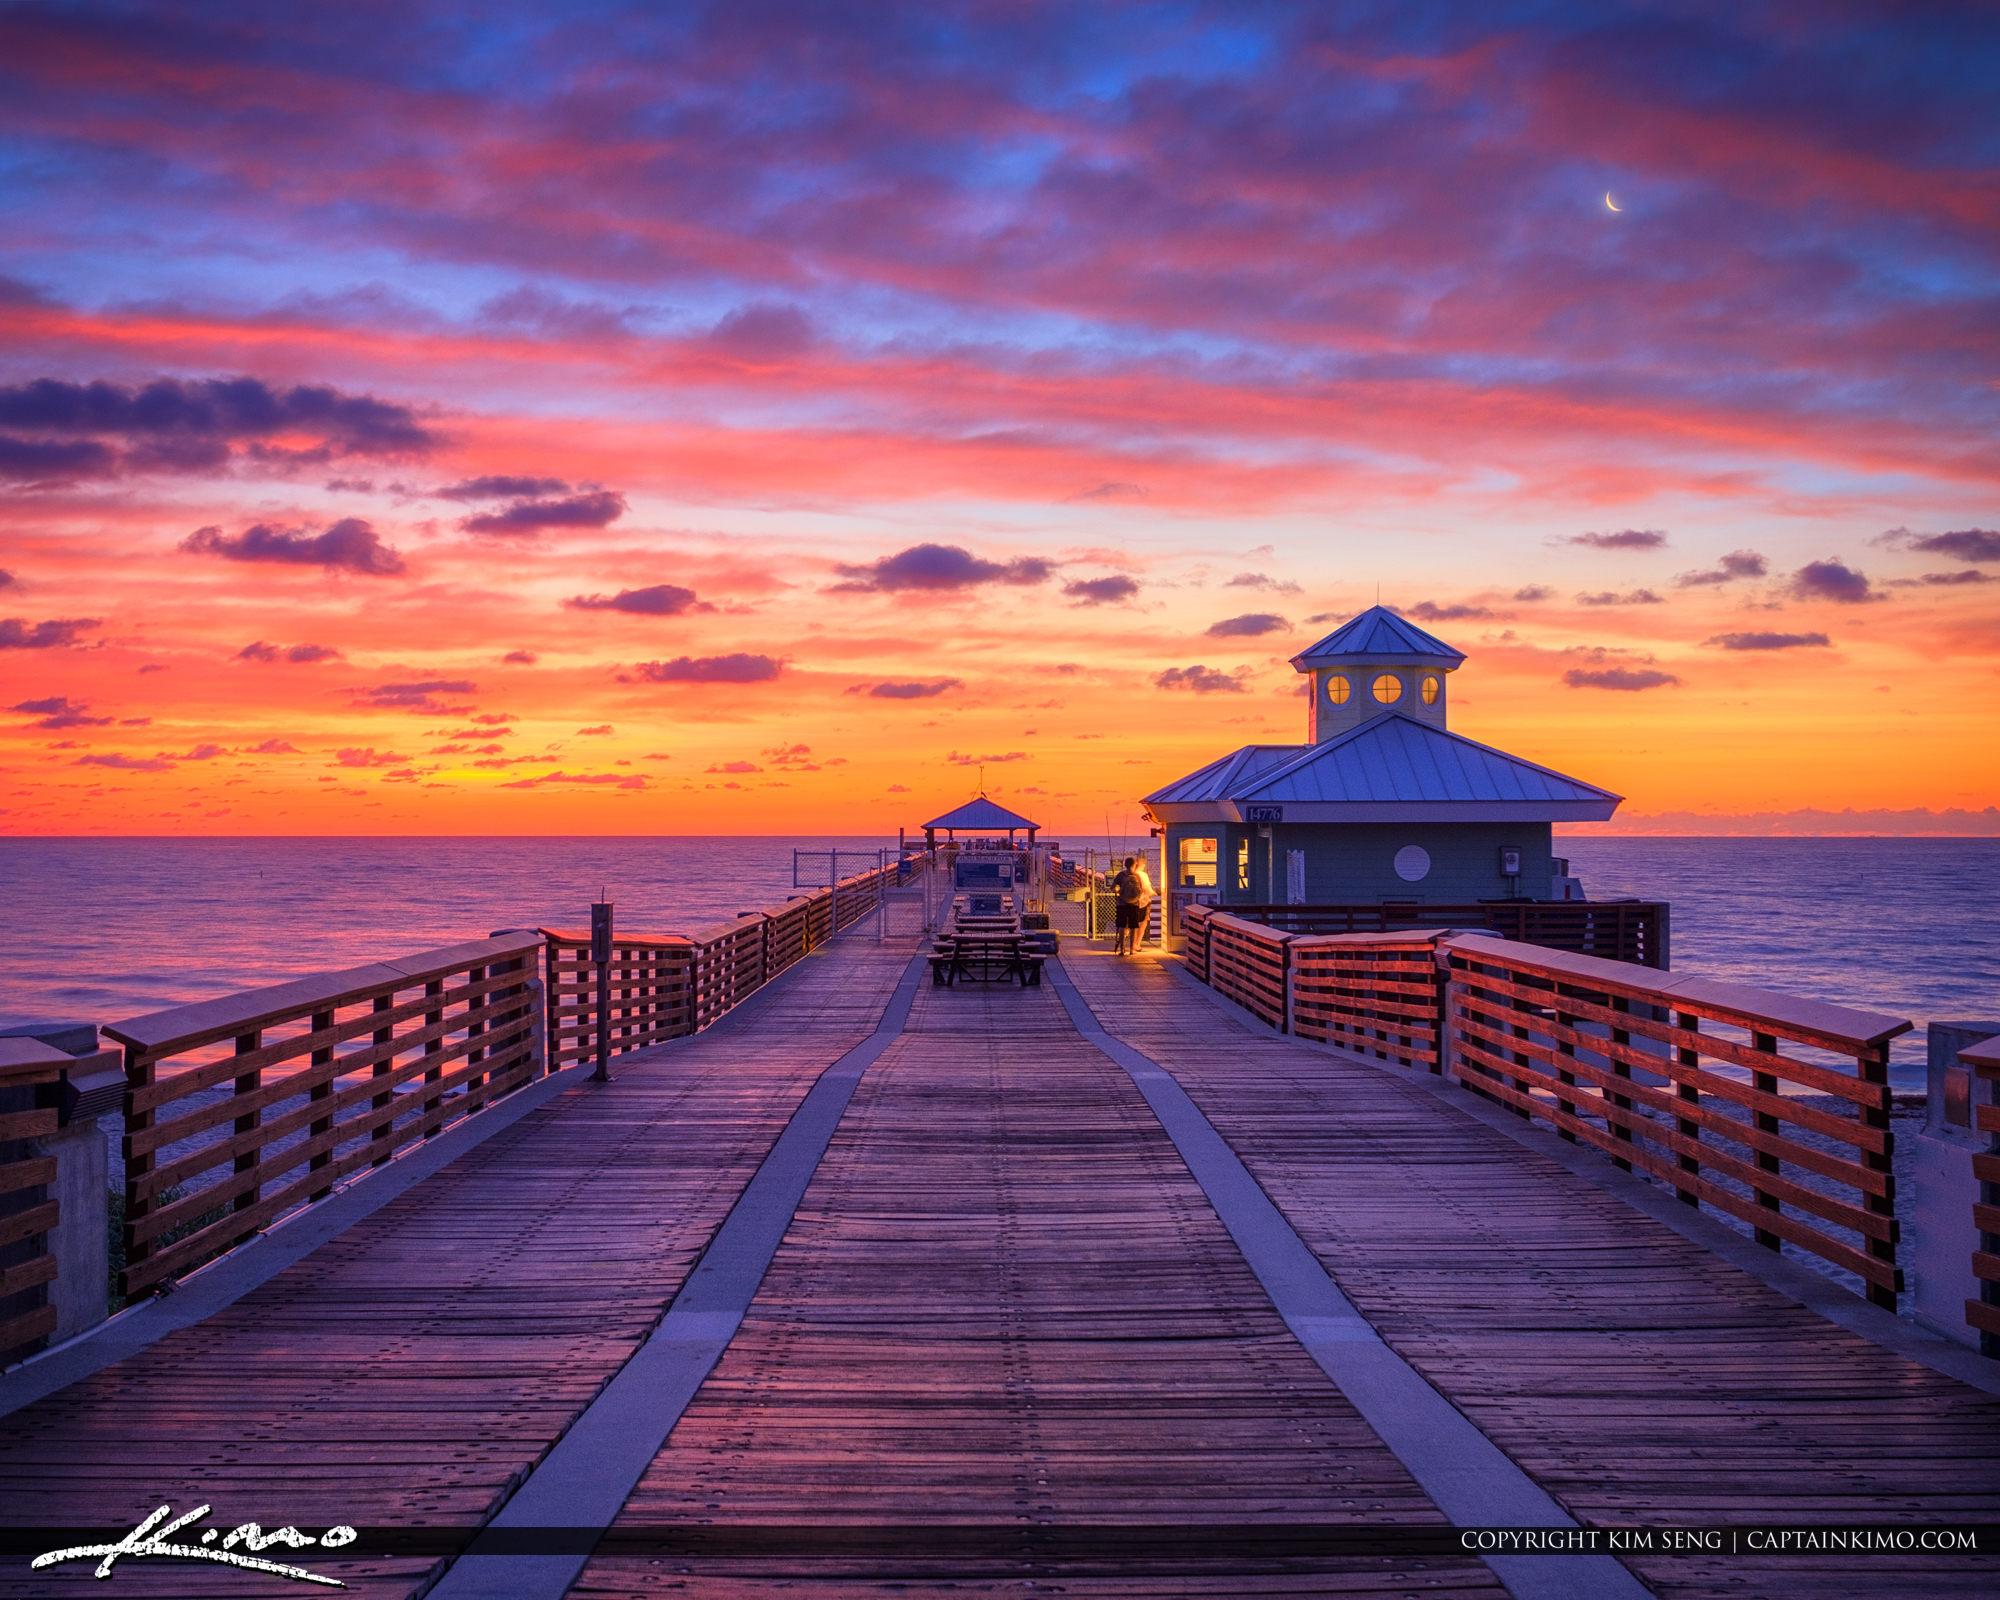 Juno Beach Pier Sunrise with Crescent Moon